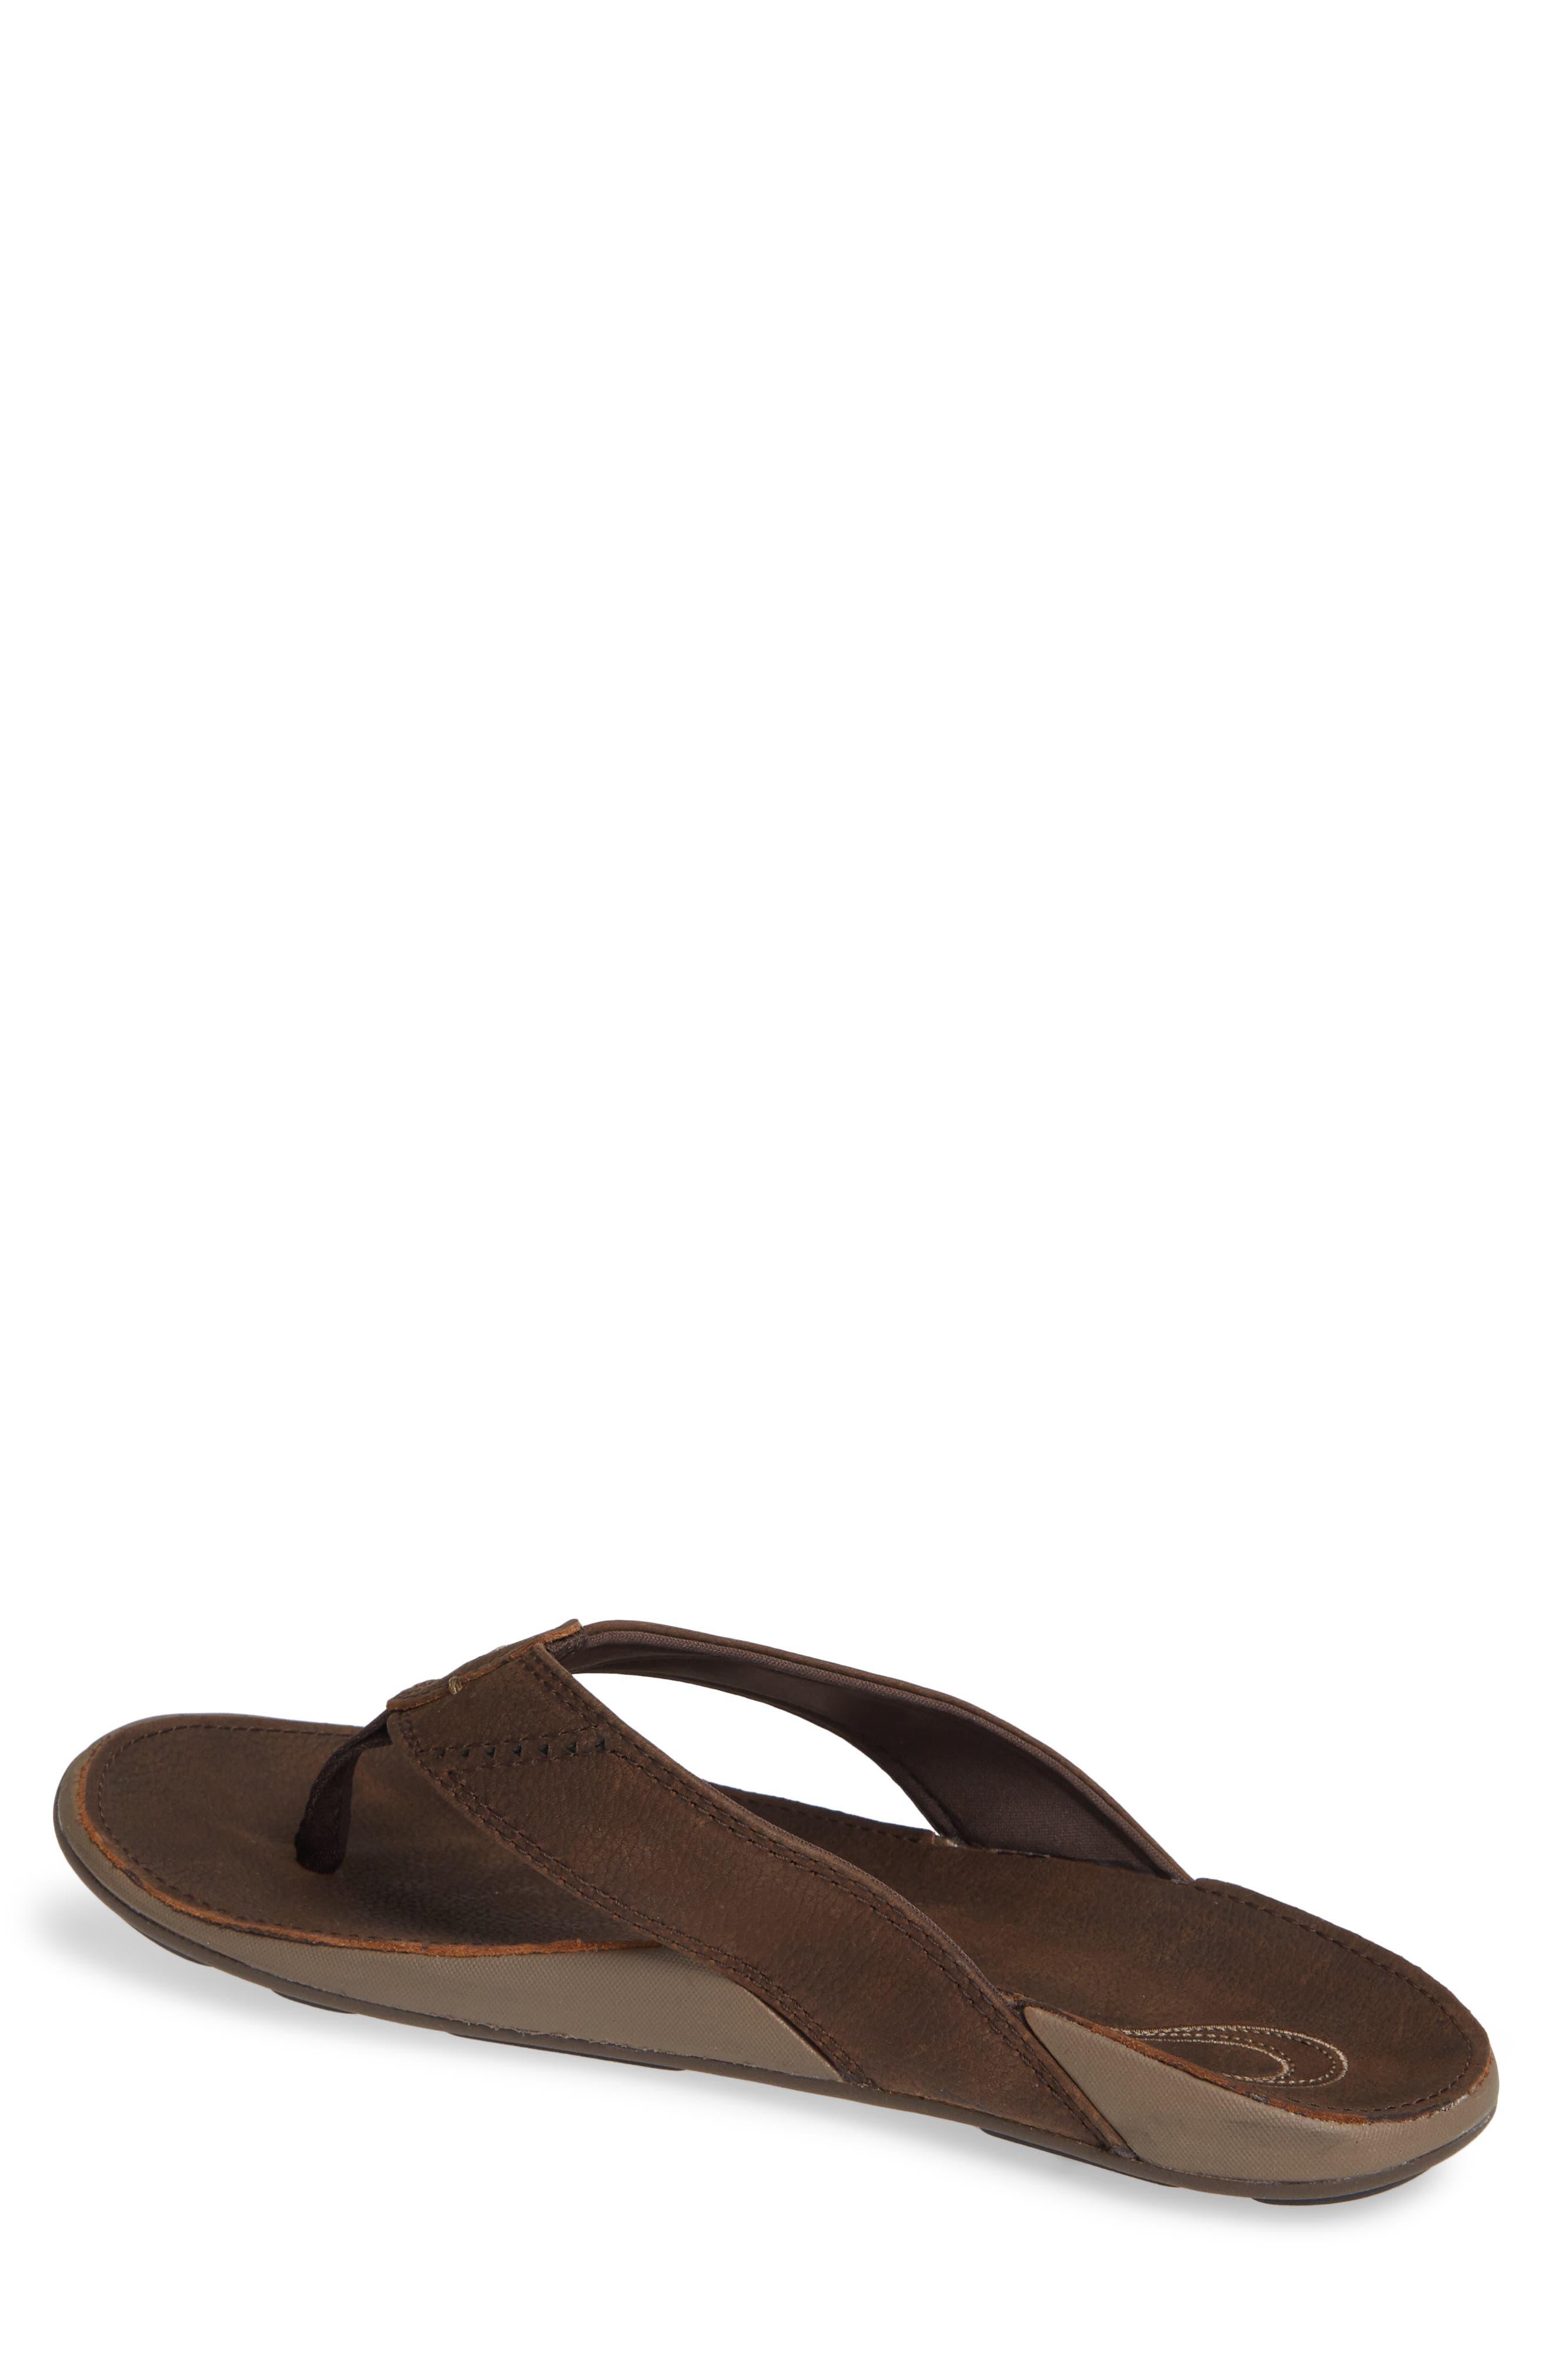 'Nui' Leather Flip Flop,                             Alternate thumbnail 2, color,                             ESPRESSO LEATHER